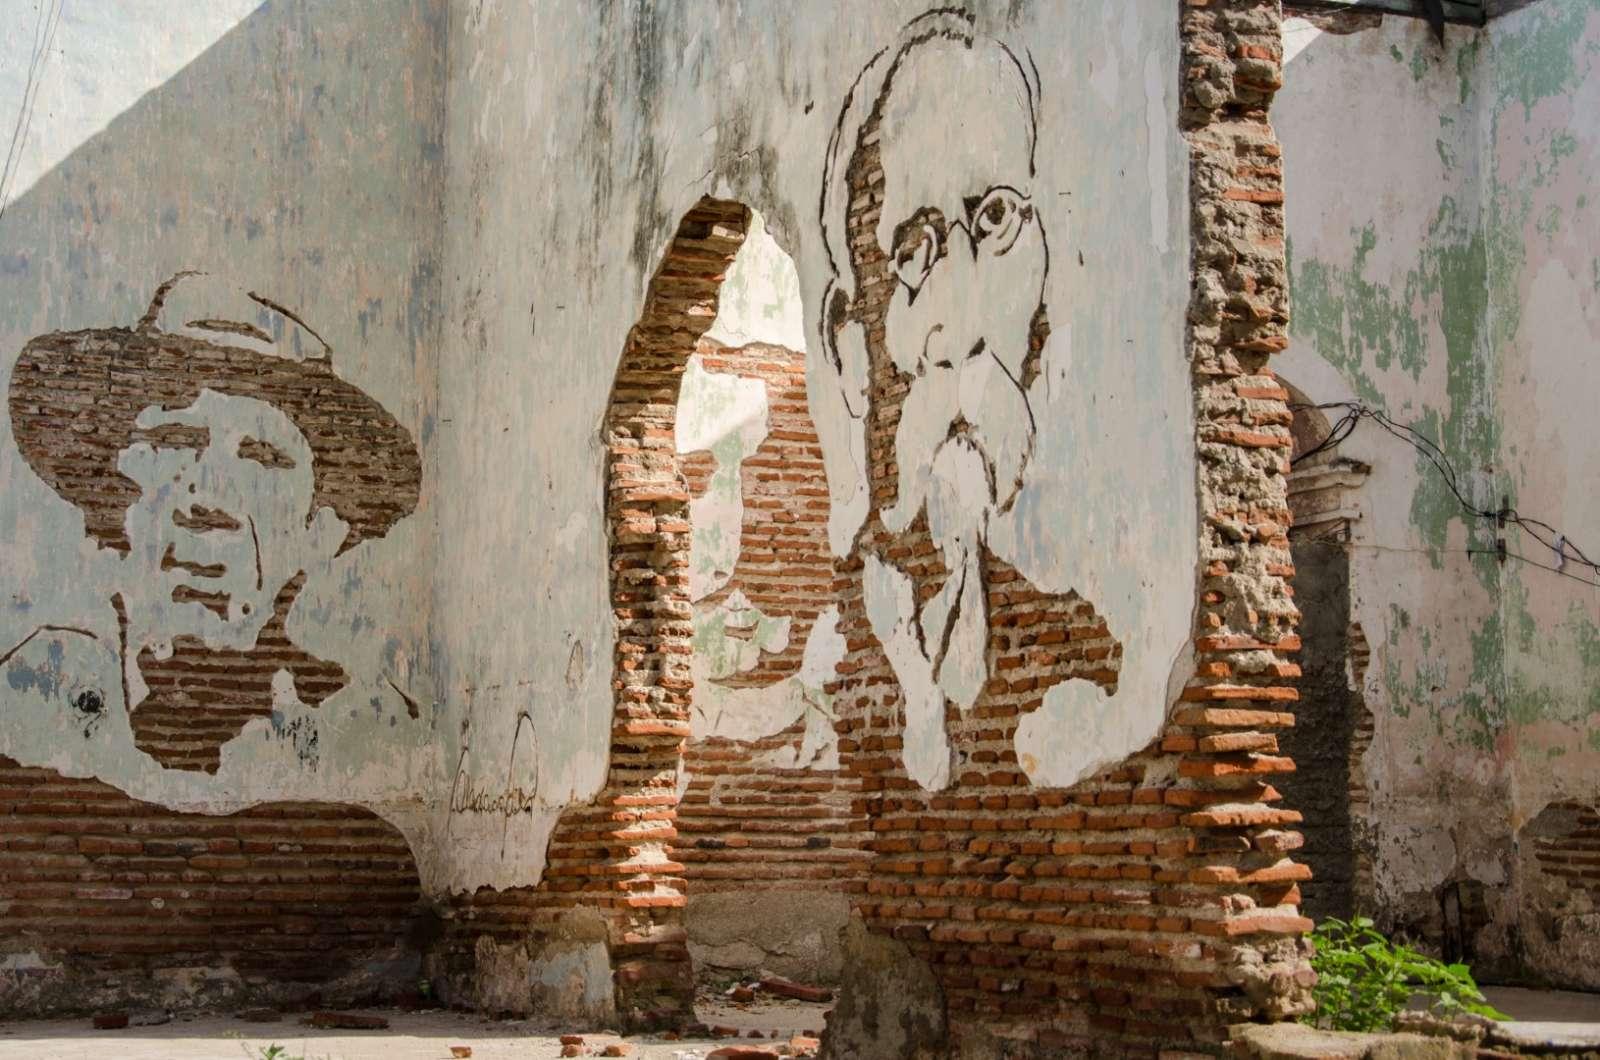 A mural in Camaguey Cuba